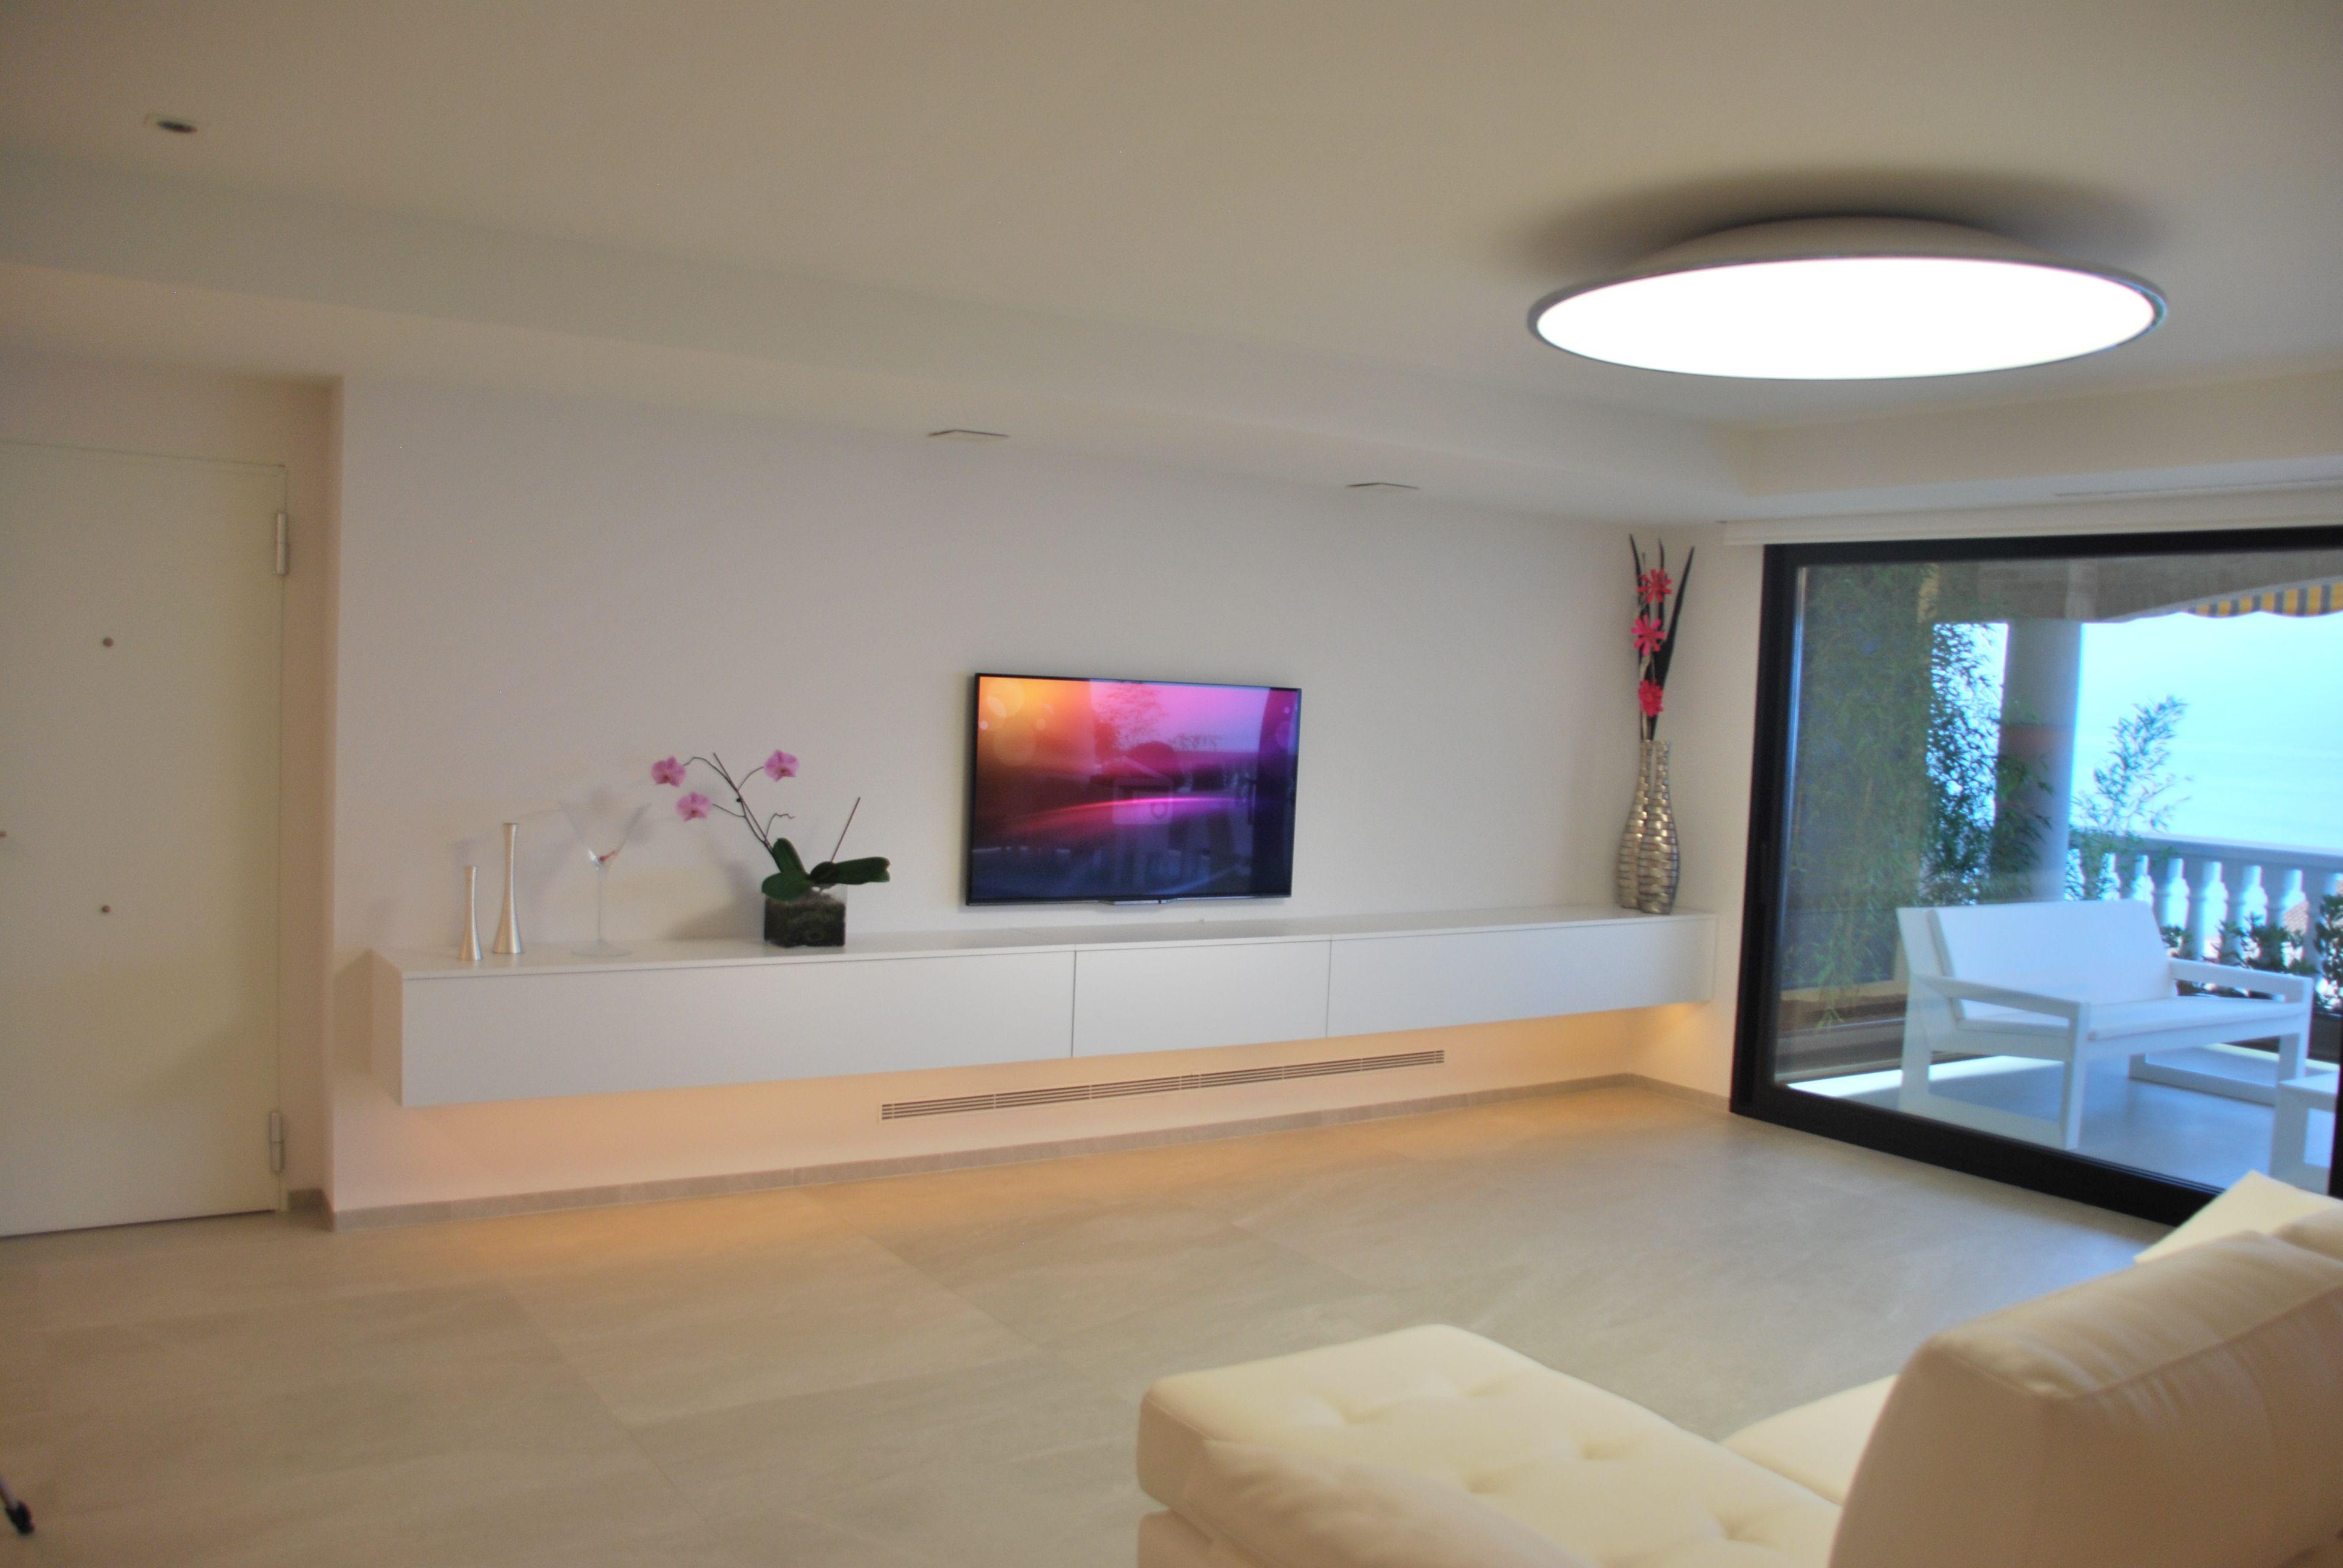 Muebles De Comedor En Murcia   Muebles De Comedor Compra Online Ikea